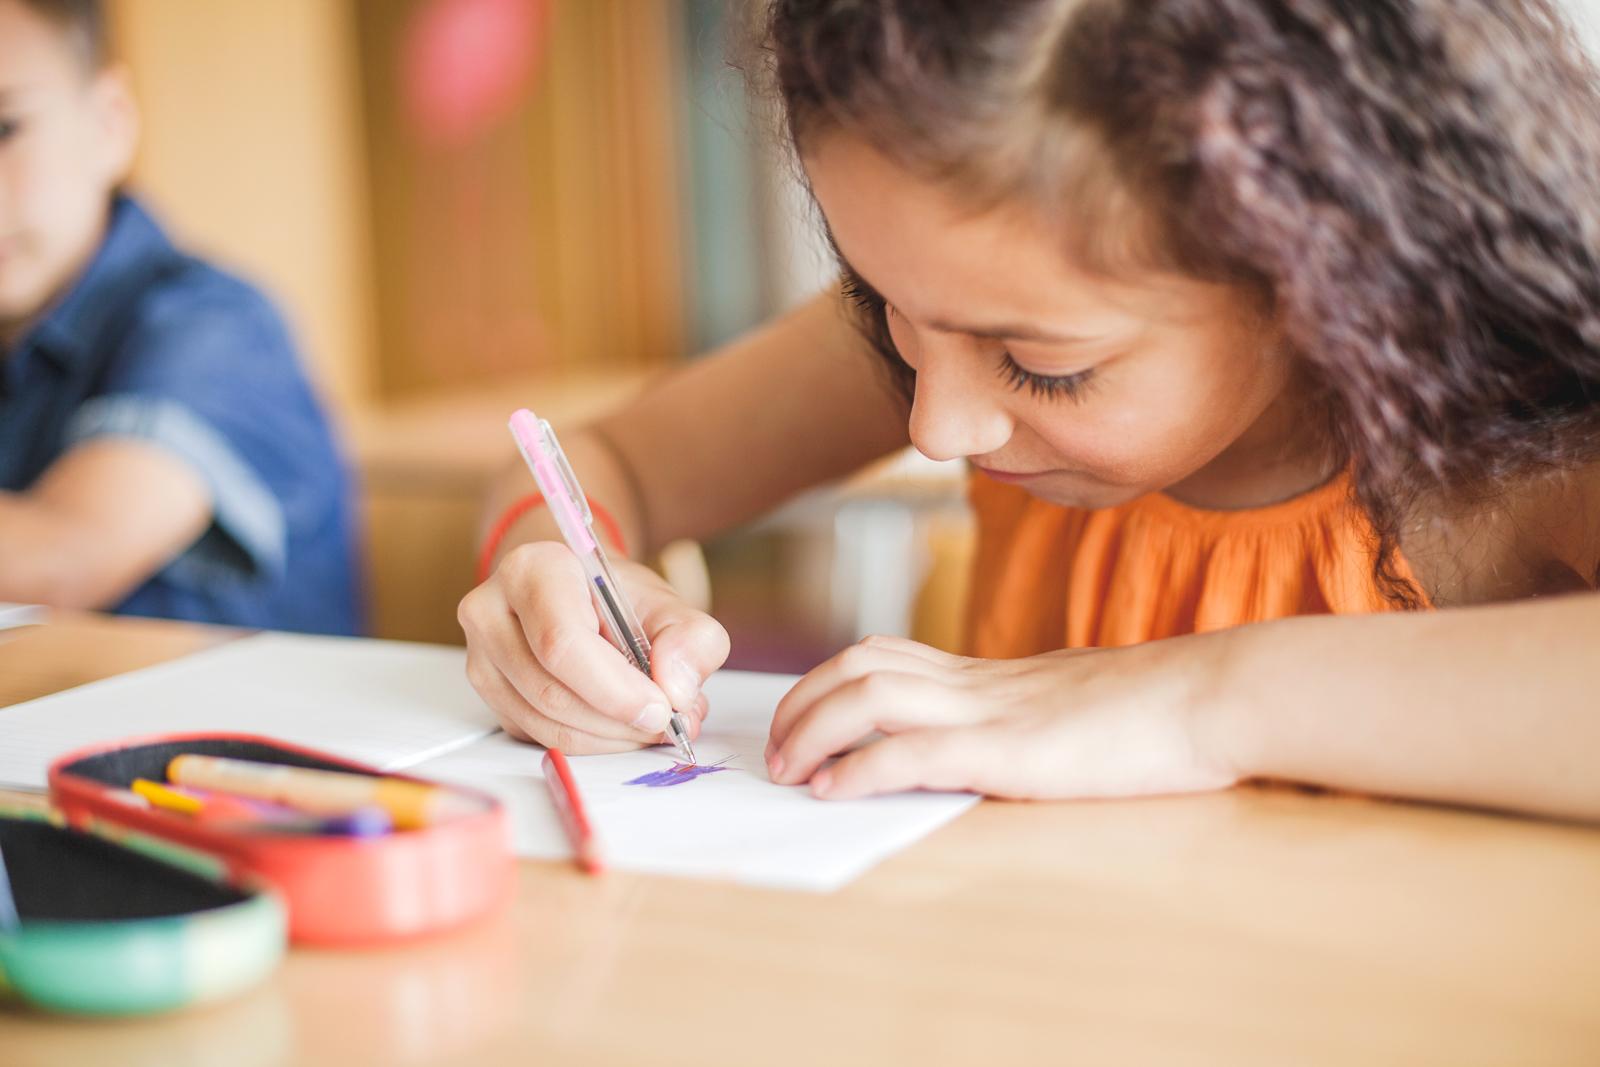 schoolgirl-sitting-table-drawing